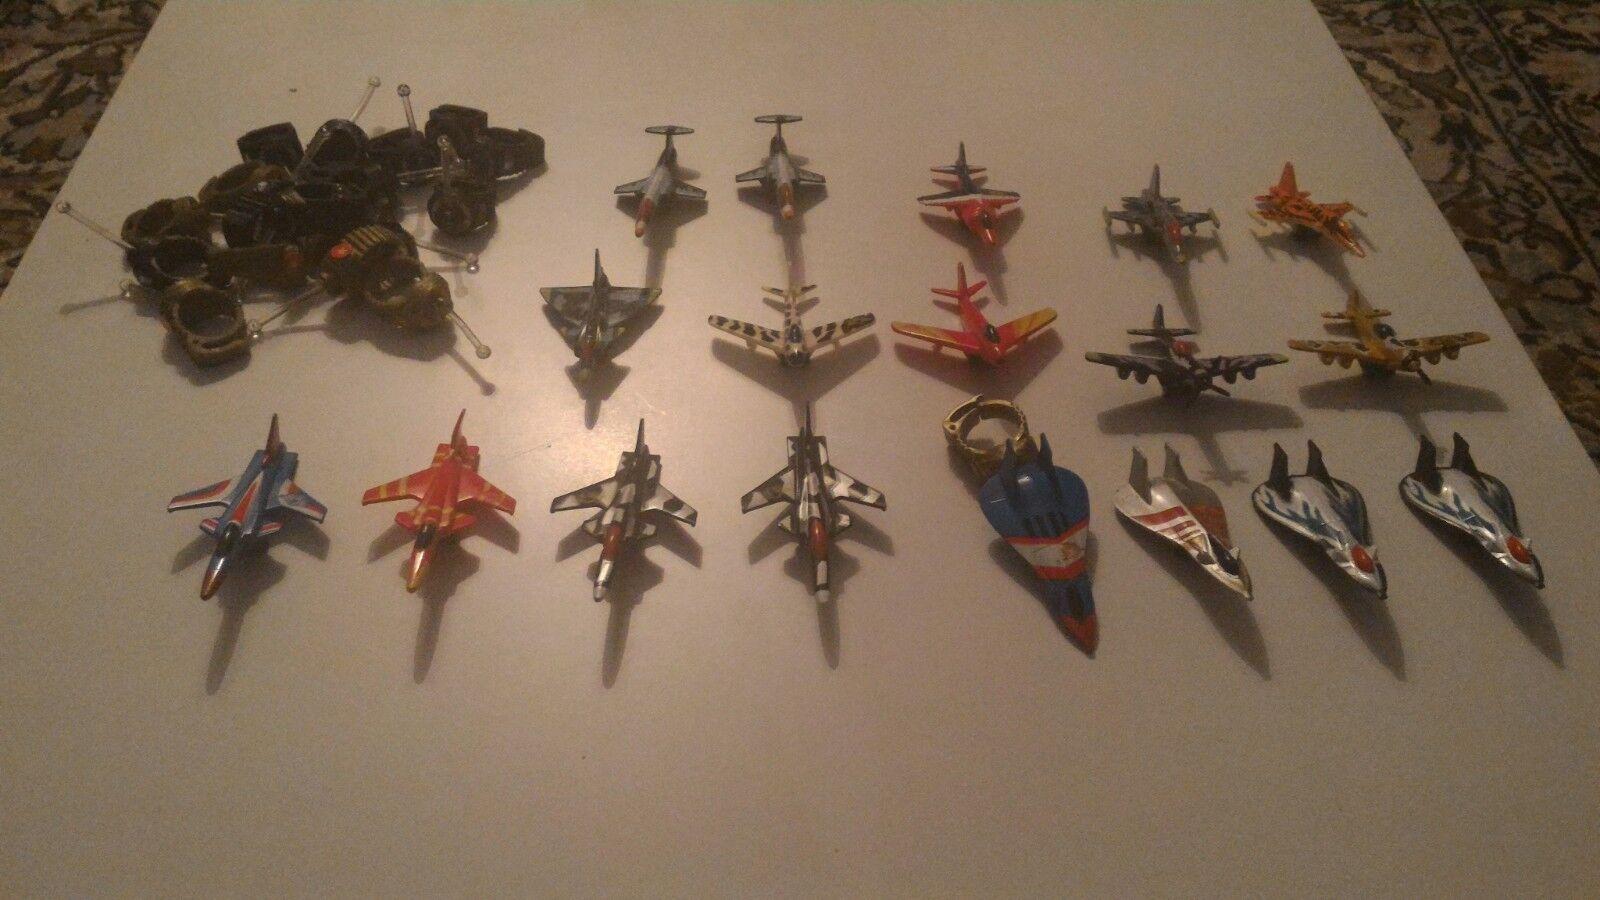 Lot x18 Vintage Matchbox Ring Raiders Mini Aeroplane Toy Figures Job Set 1980s